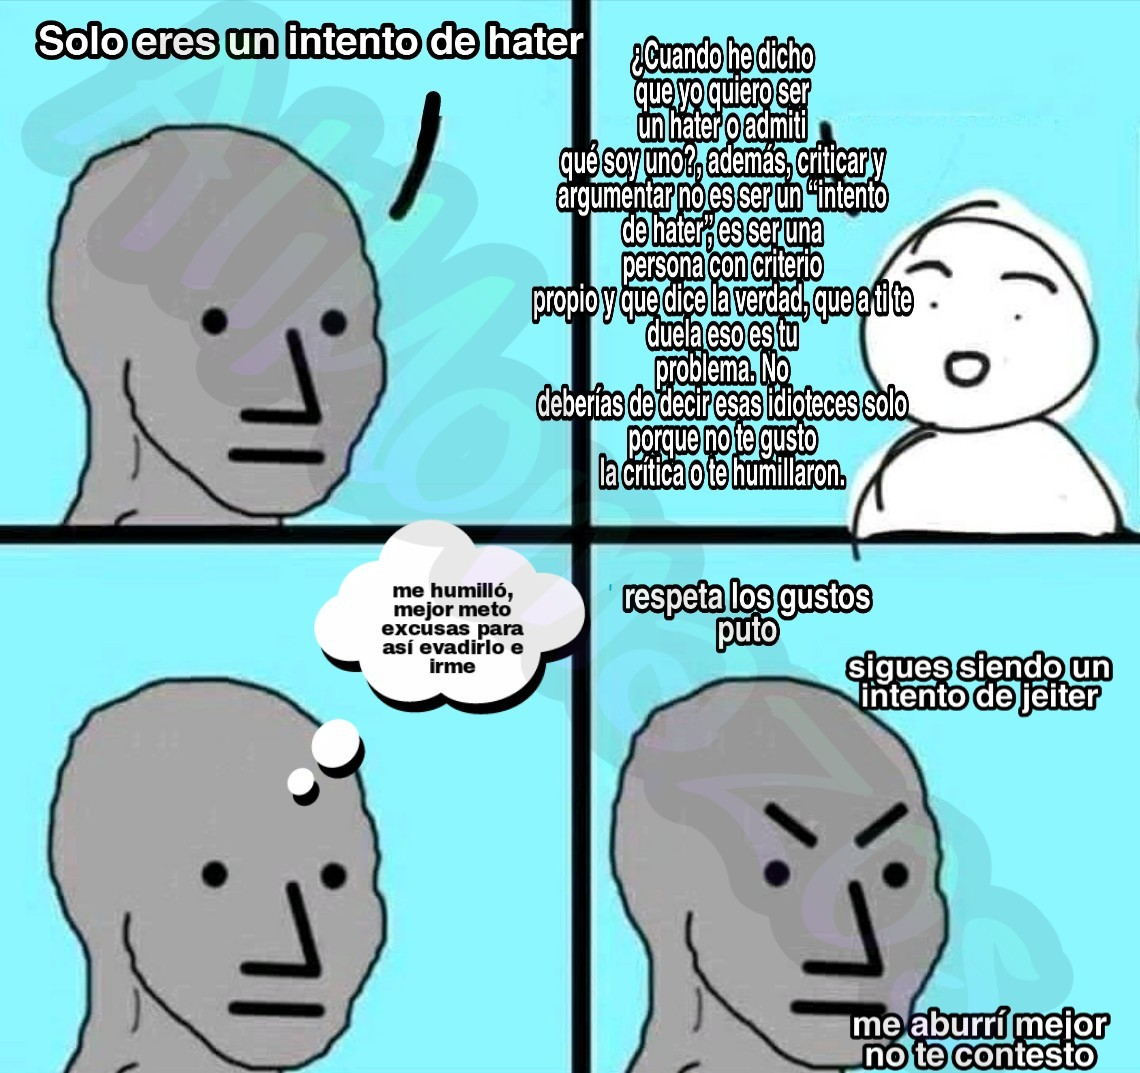 Humilla3 - meme